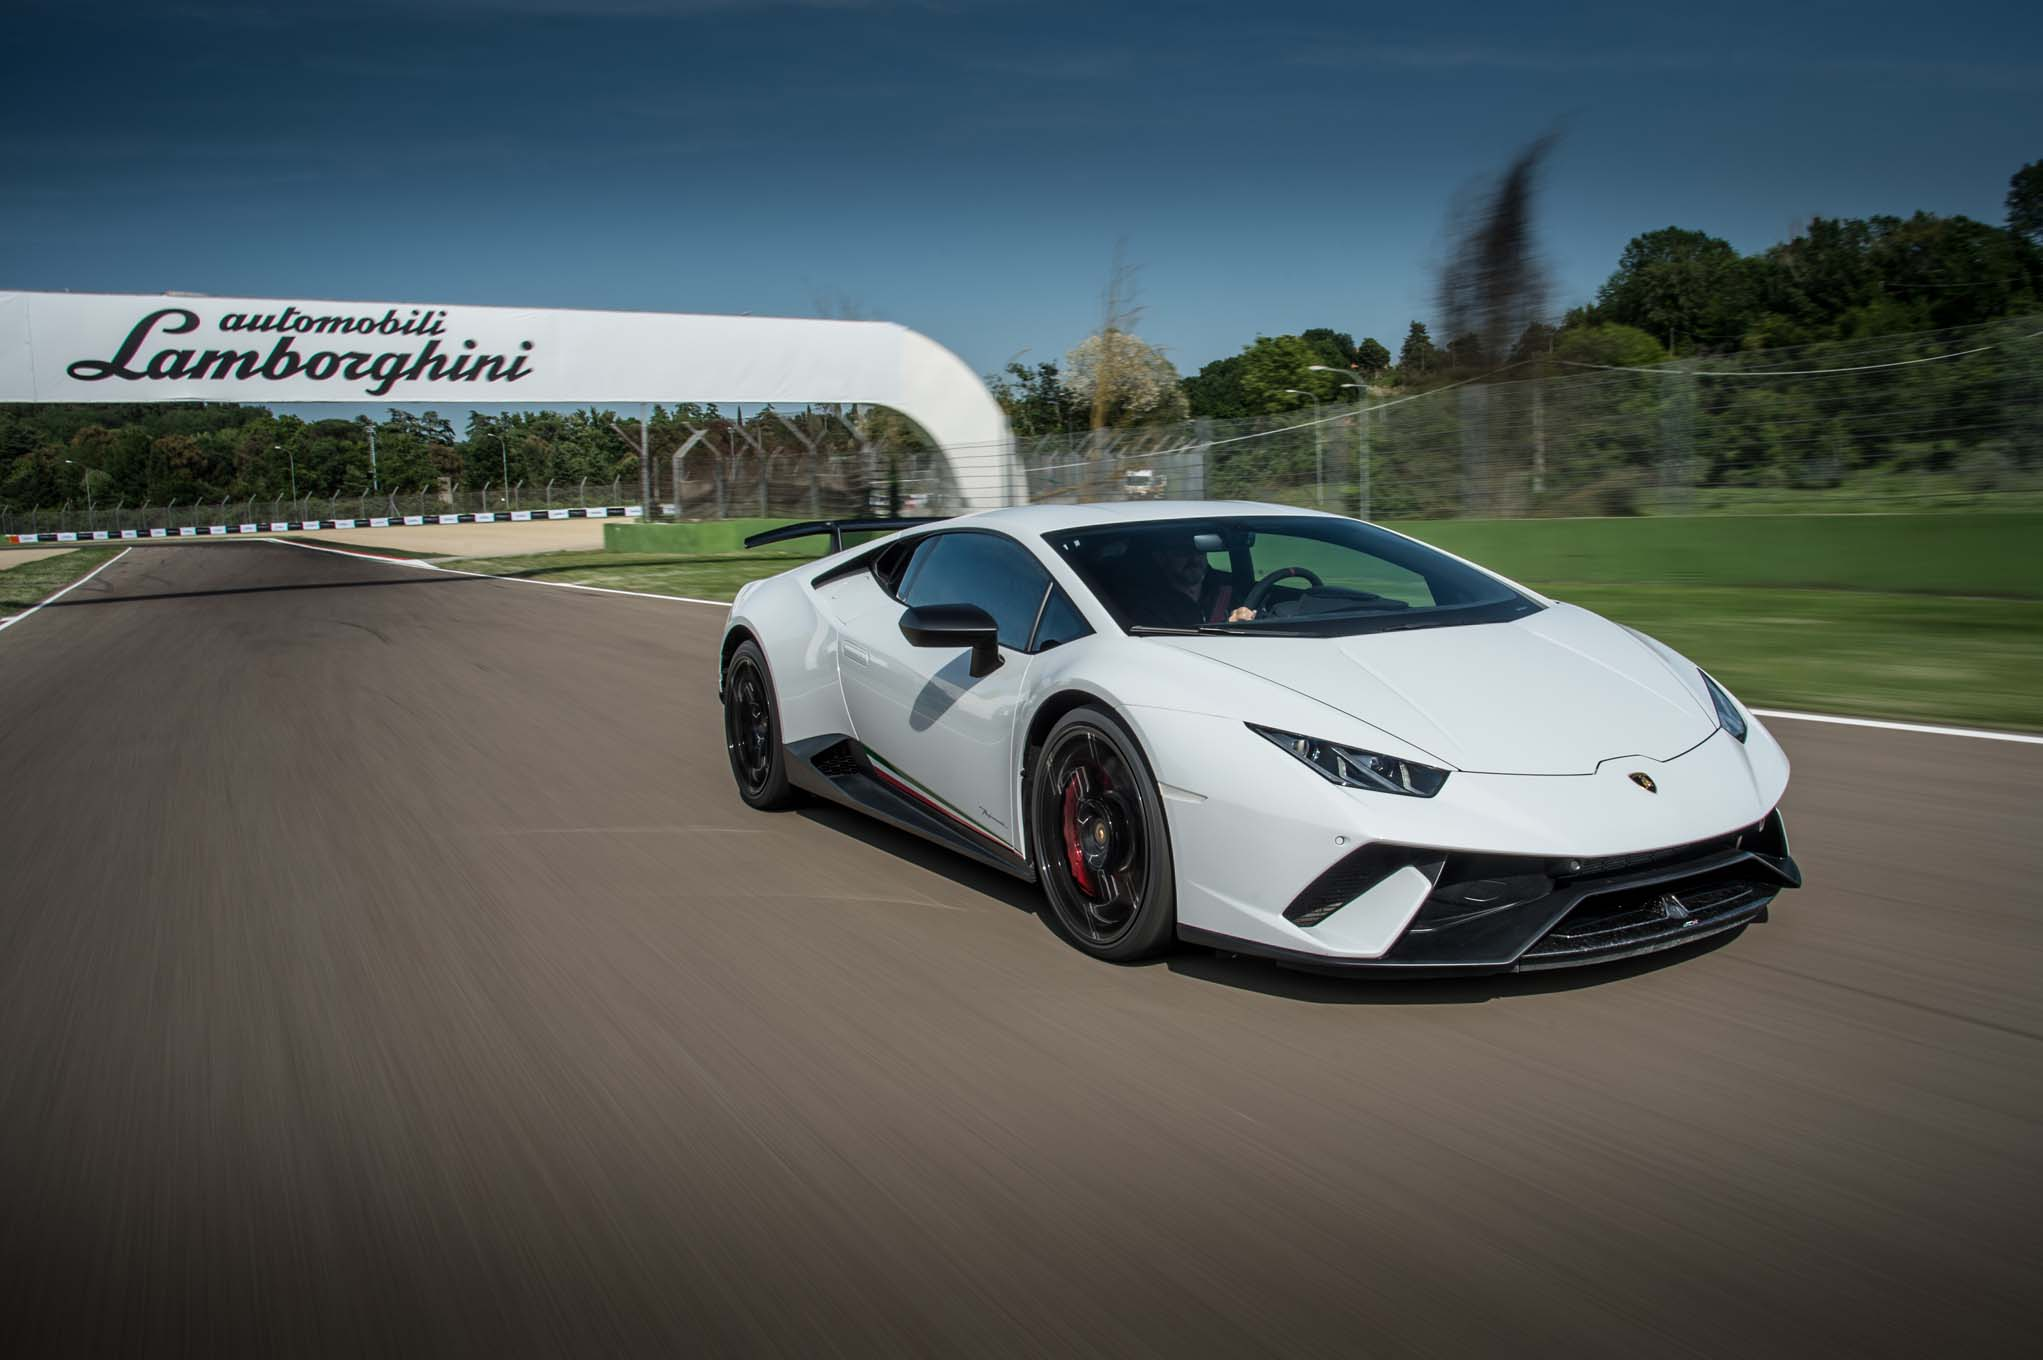 2018 Lamborghini Huracan Performante First Drive Review Automobile Magazine